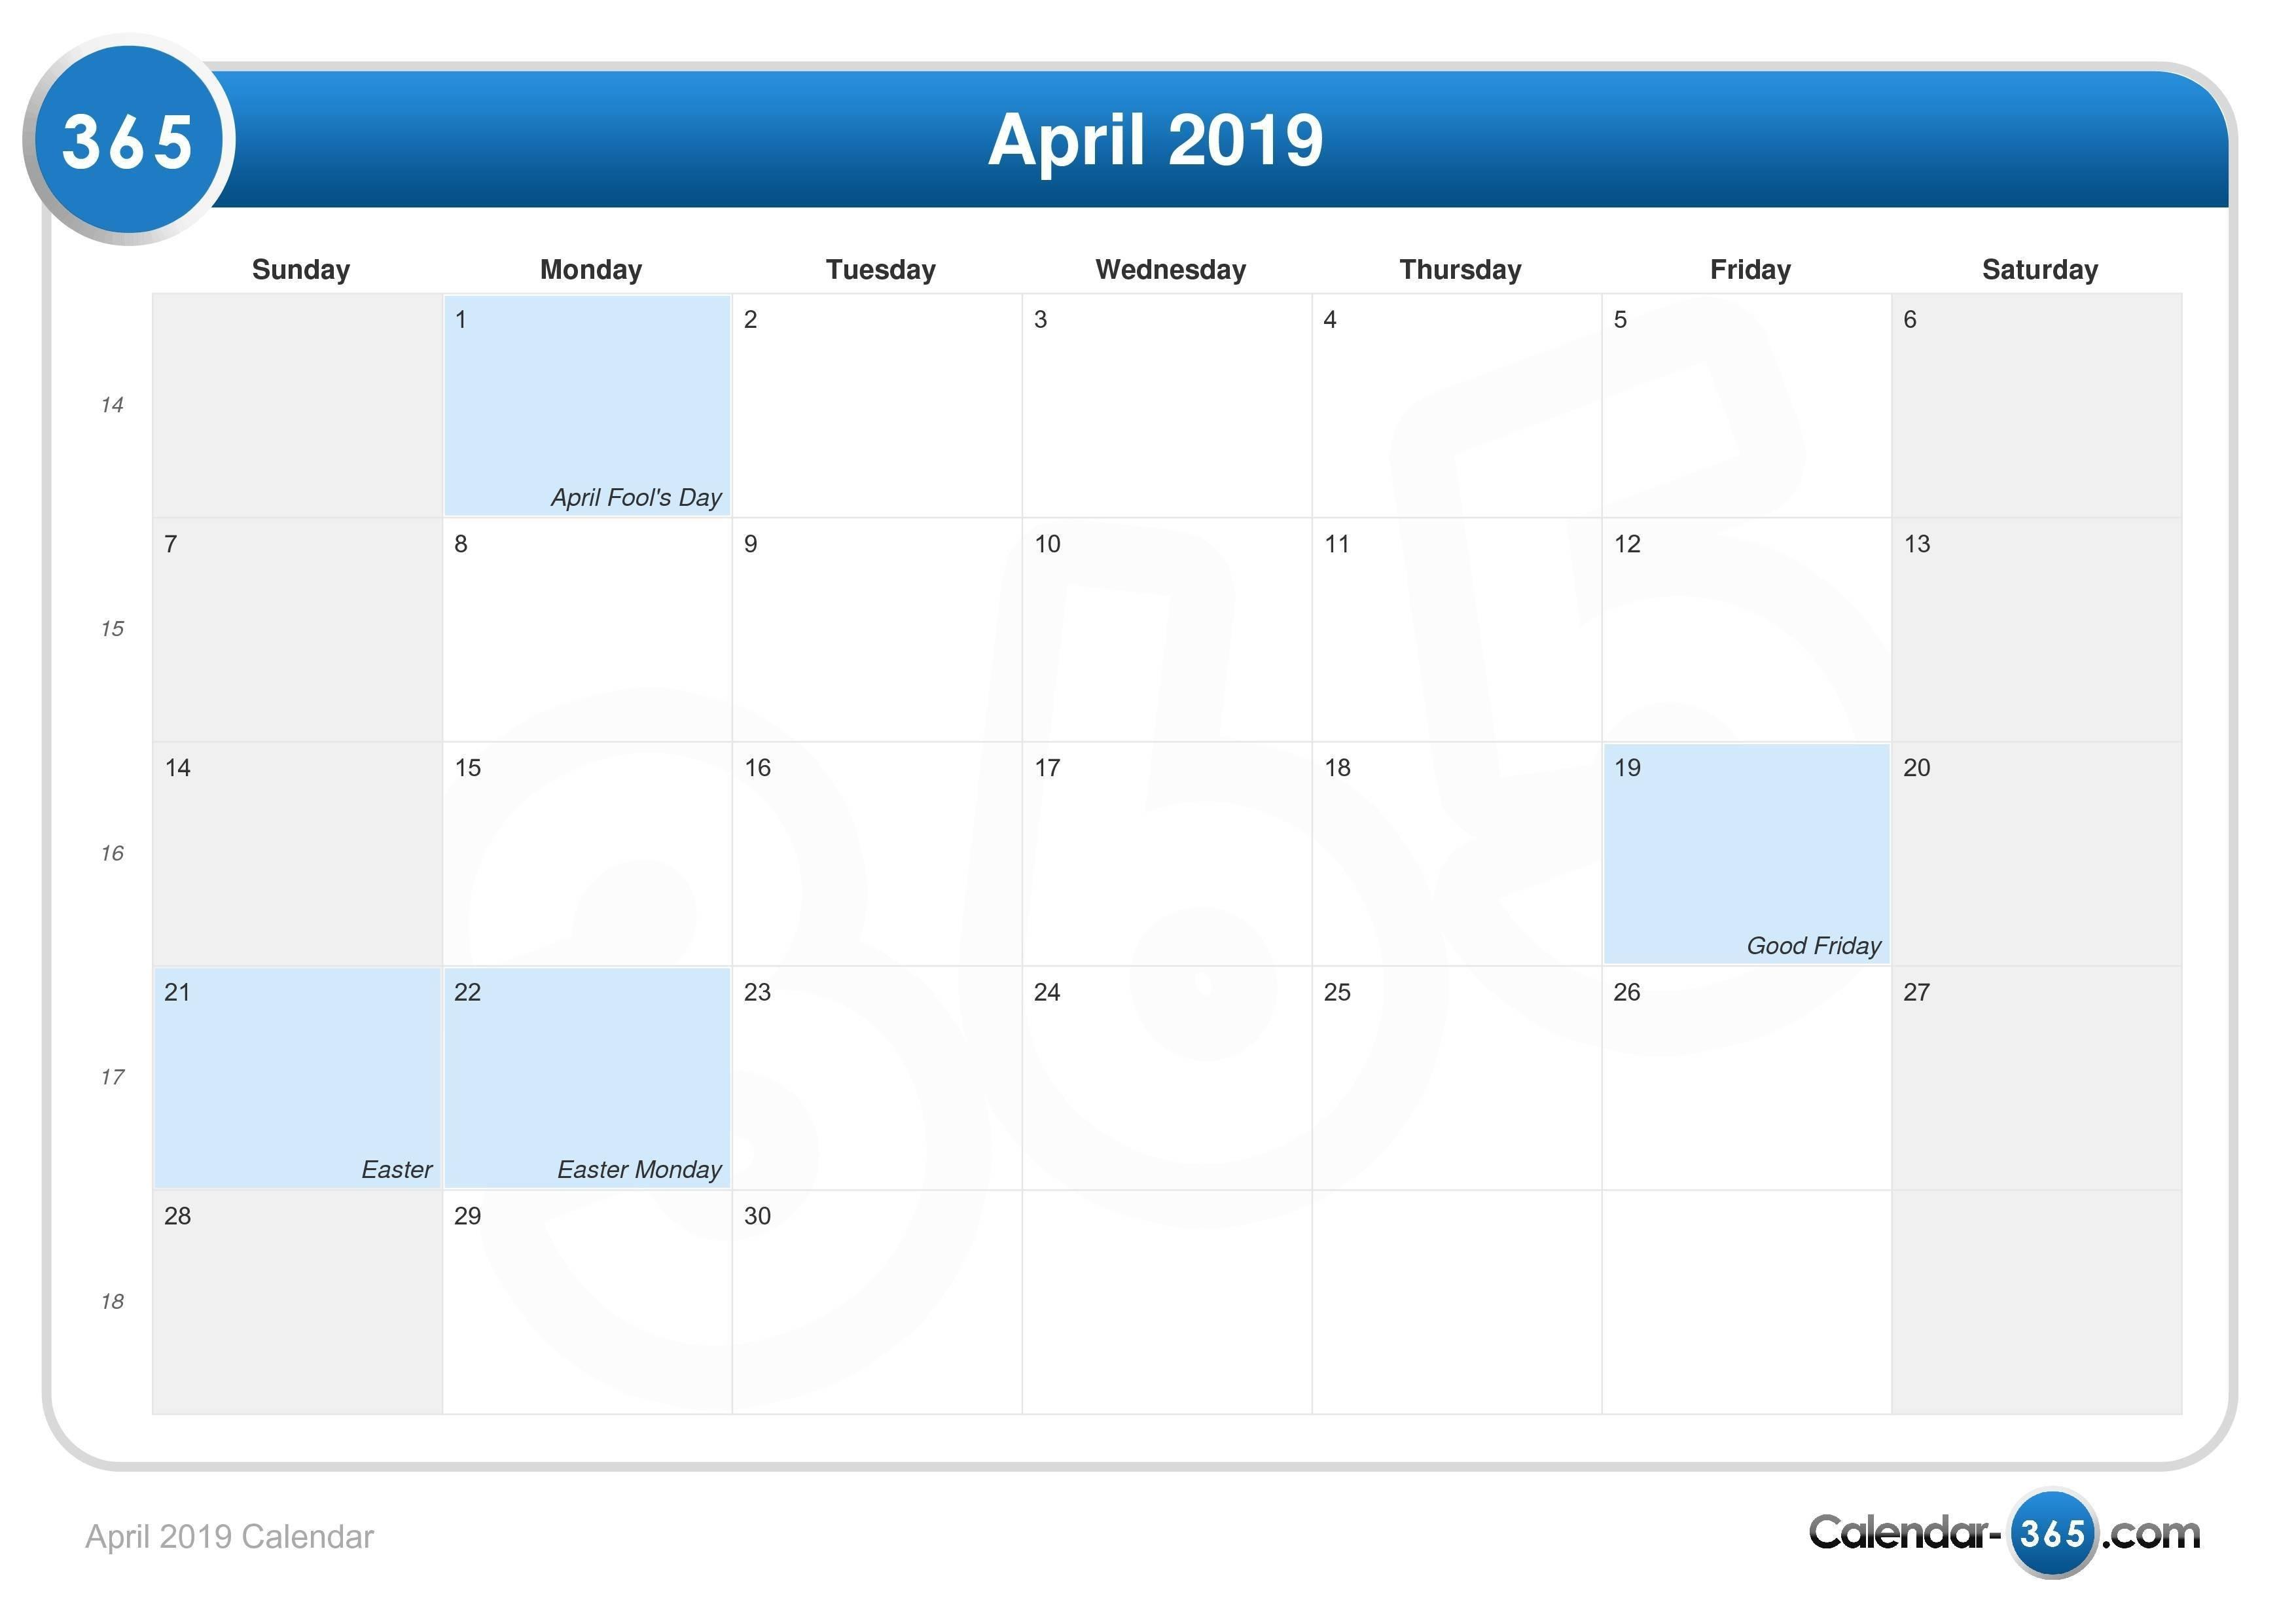 April 2019 Calendar Calendar Week 16 2019